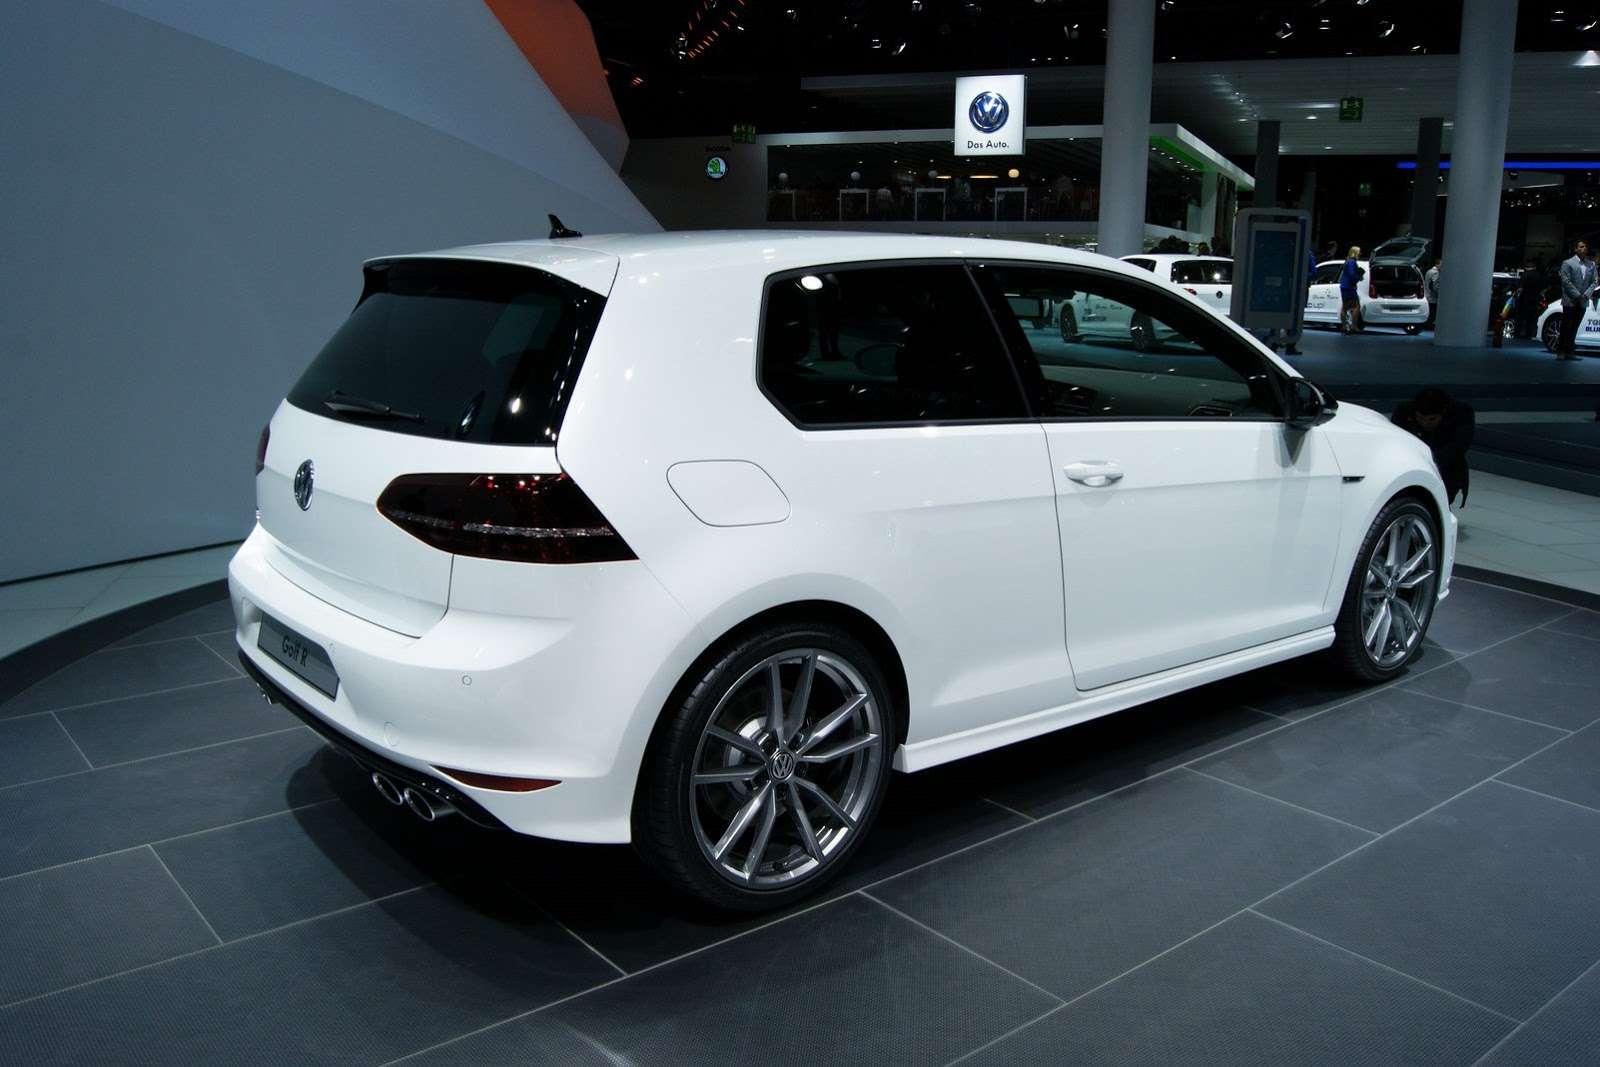 Volkswagen Golf R Frankfurt 2013